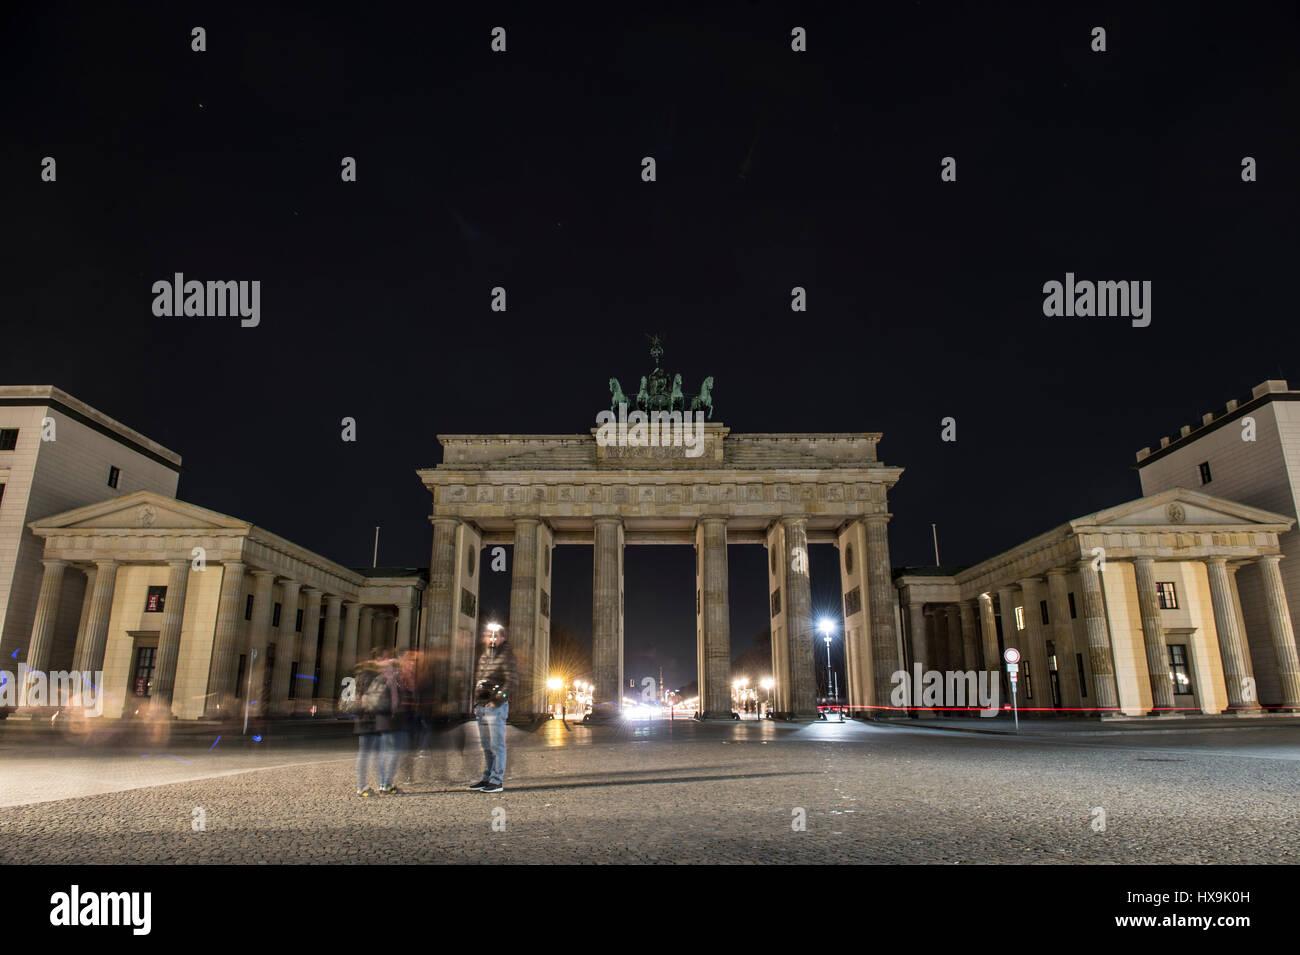 "Berlin, Deutschland. 25. März 2017. Das Brandenburger Tor kurz vor ""Earth Hour"" in Berlin, Deutschland, 25. März 2017 leuchtet. Foto: Paul Zinken/Dpa/Alamy Live News Stockfoto"